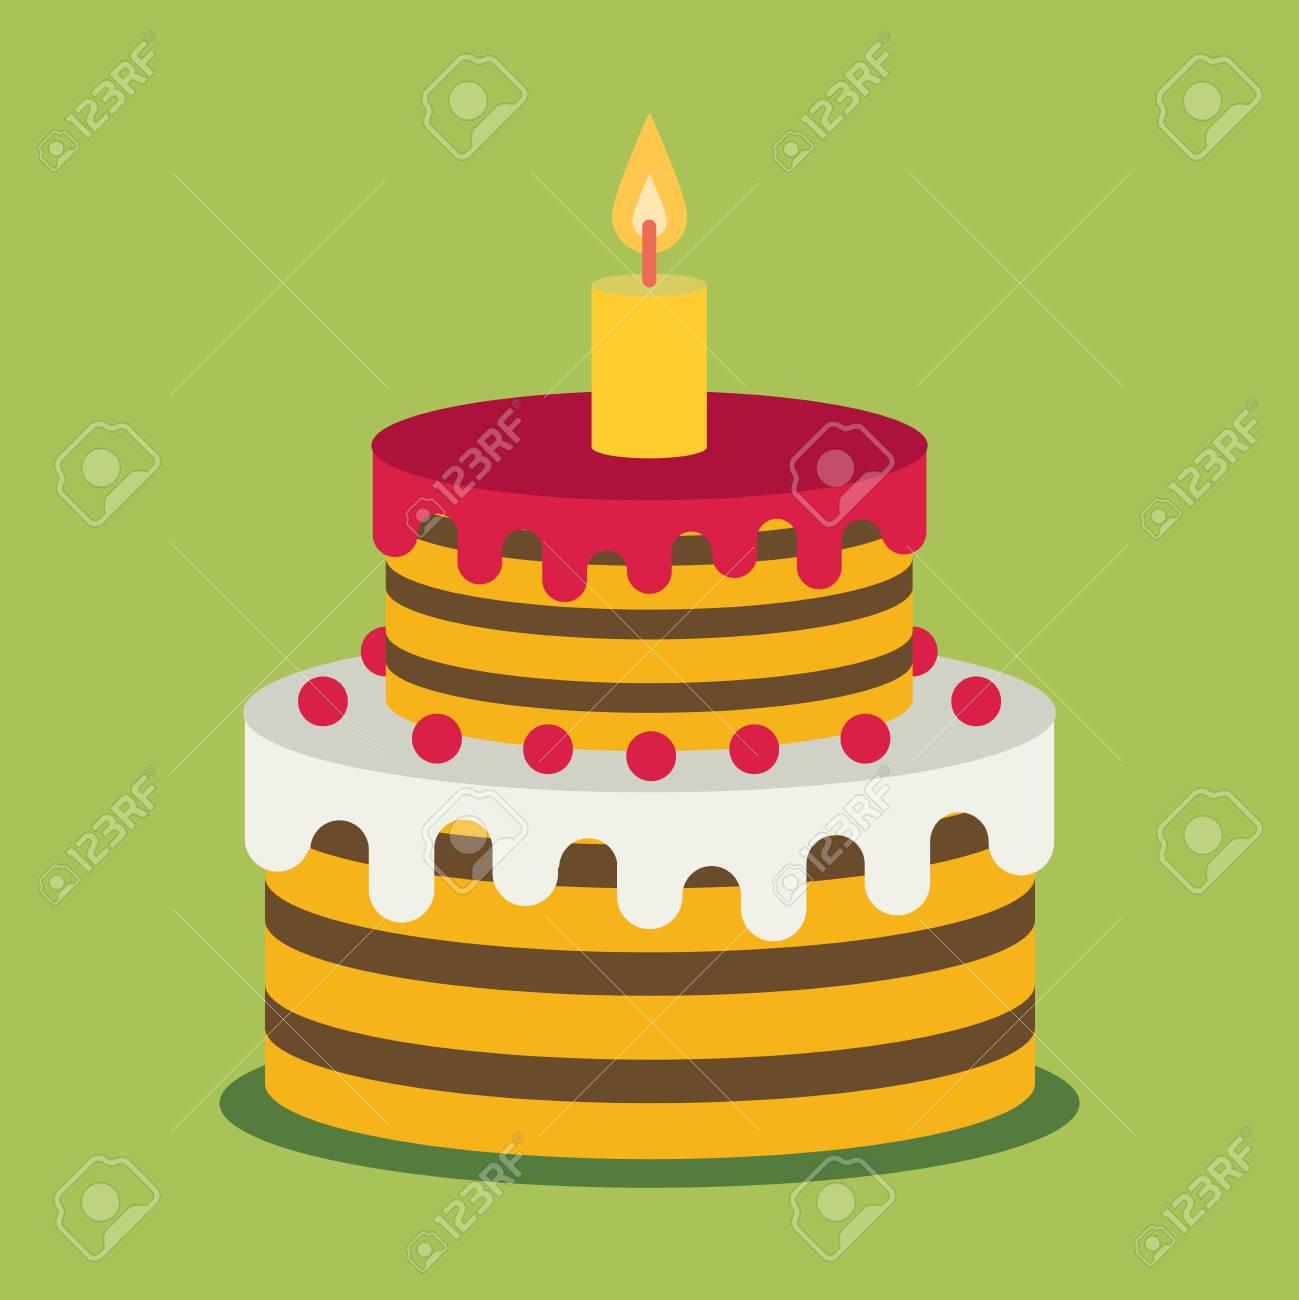 Birthday Cake Sweet Cupcakes Cartoon Vector Illustration Flat